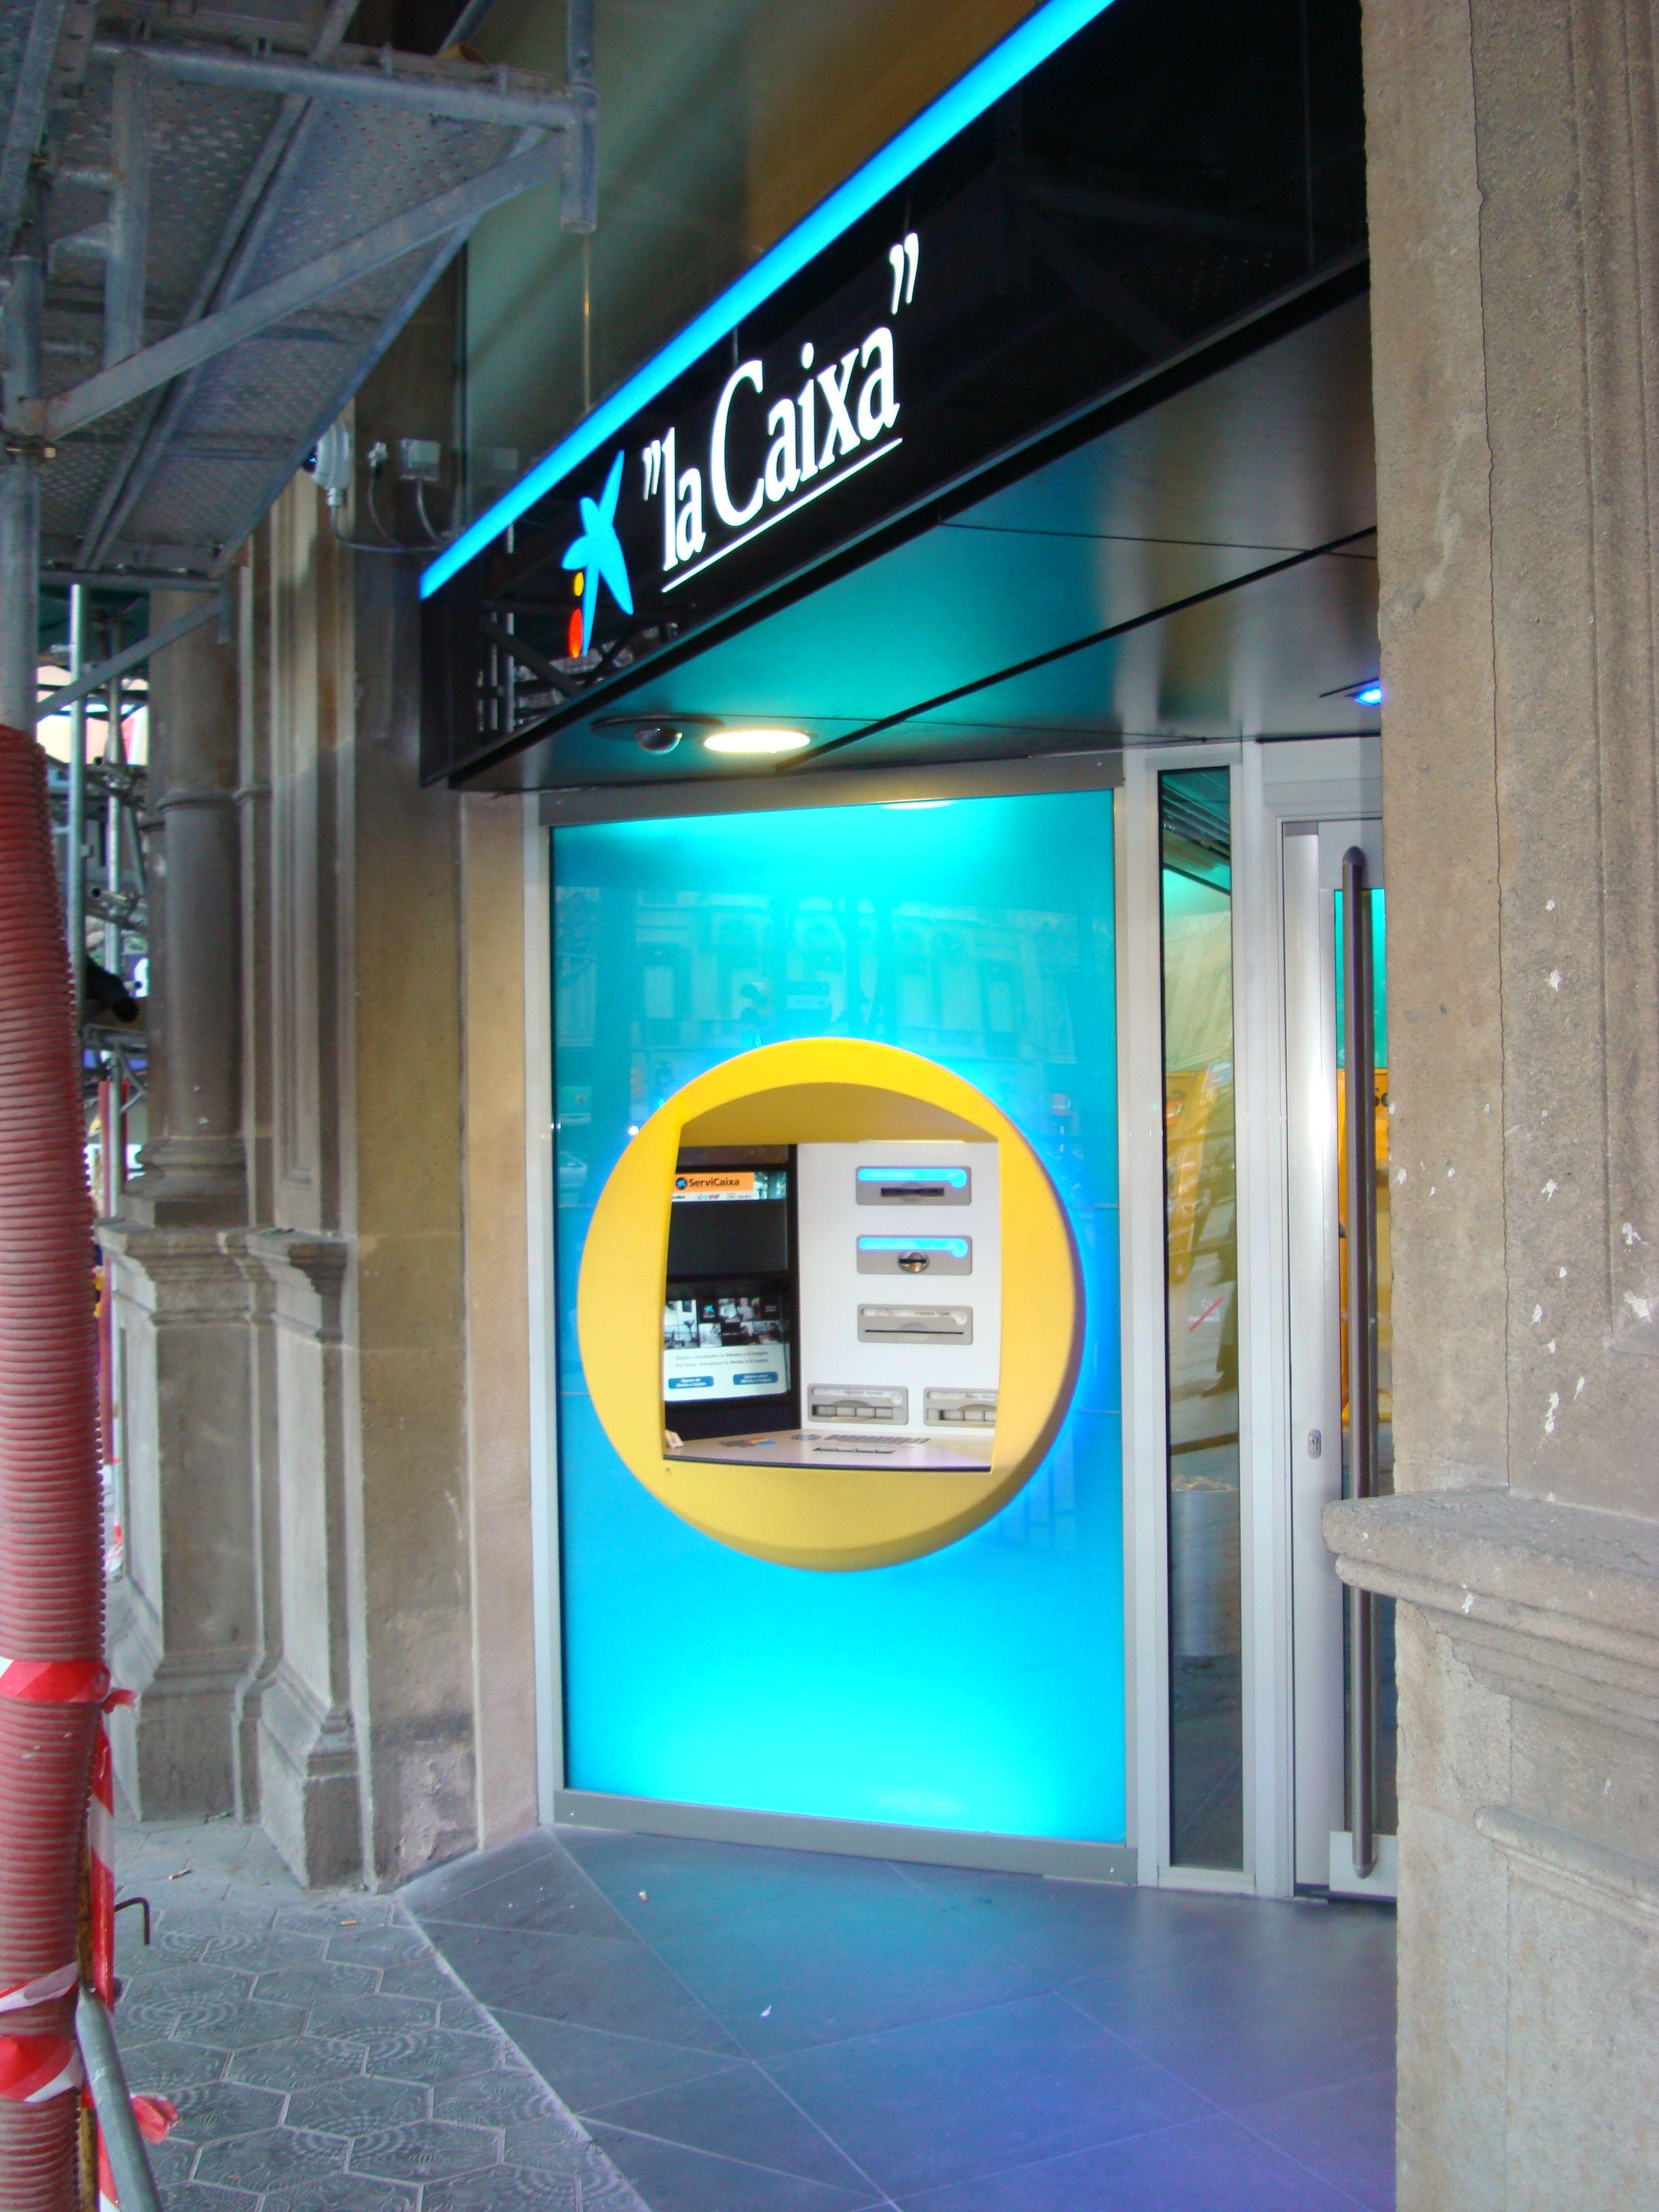 43 Ideas De Banca Banca Proyectos Banca Privada